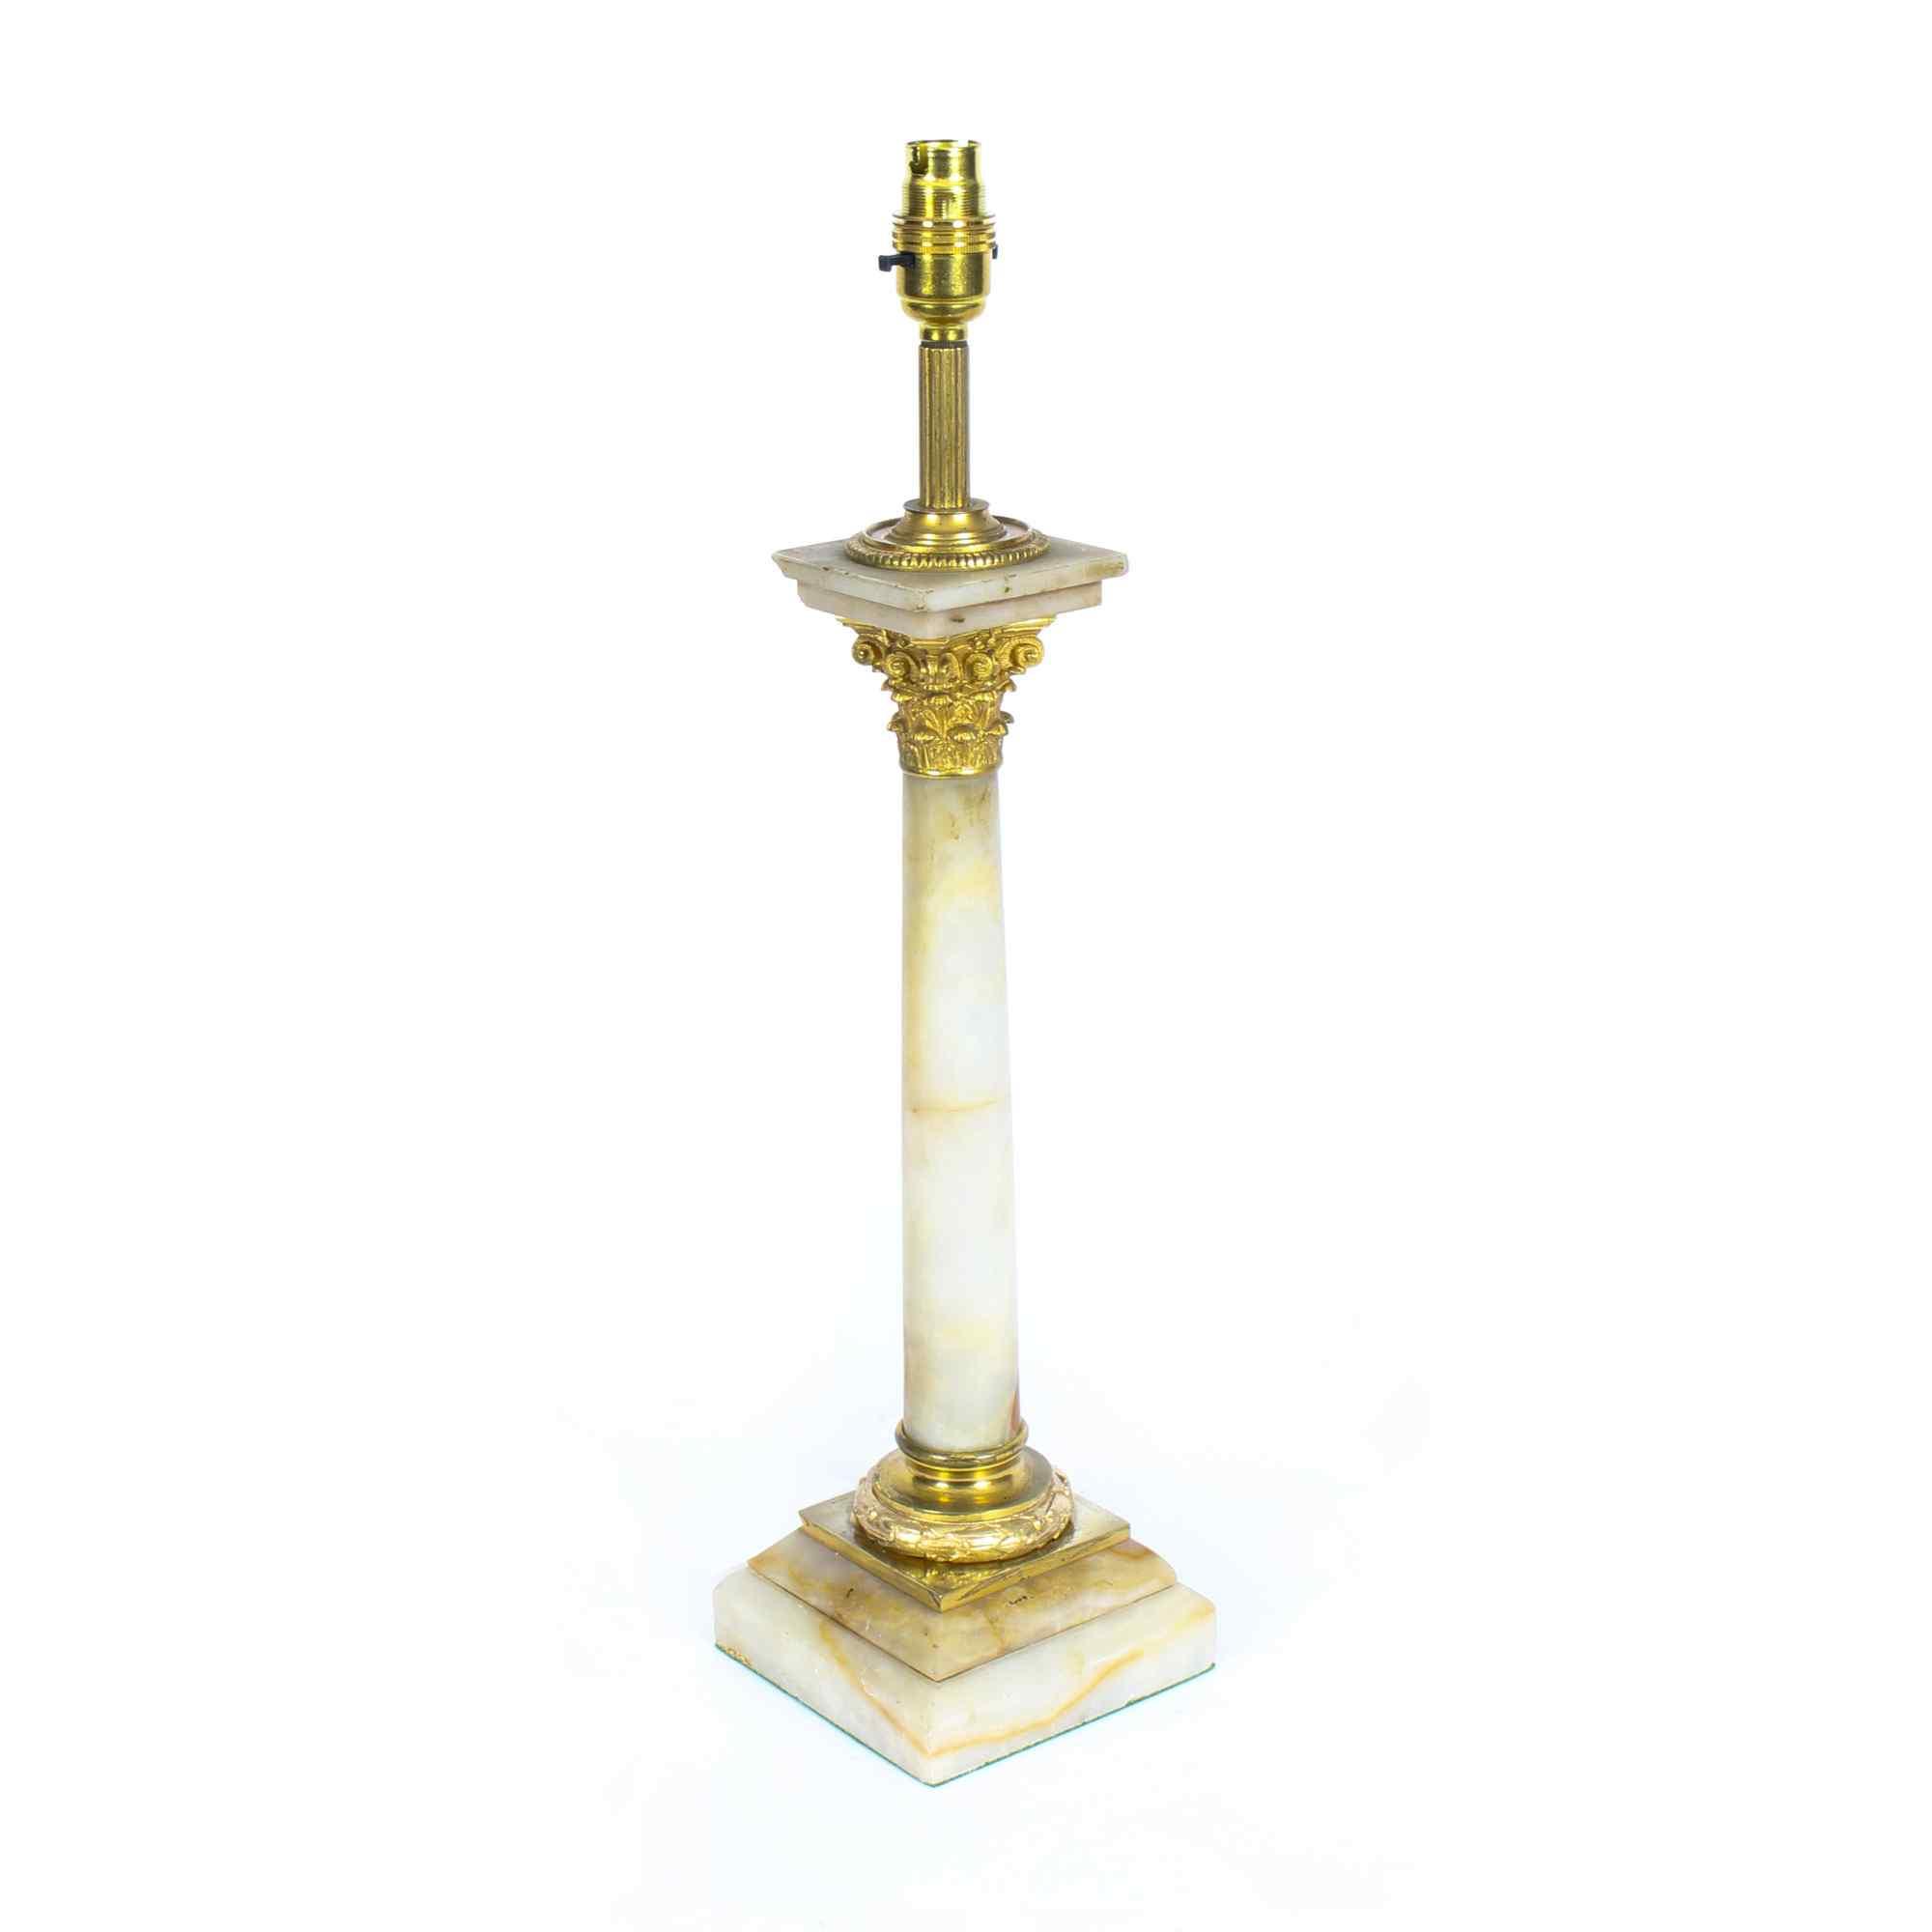 Lampada da tavolo antica vittoriana Ormolu onice colonna cor